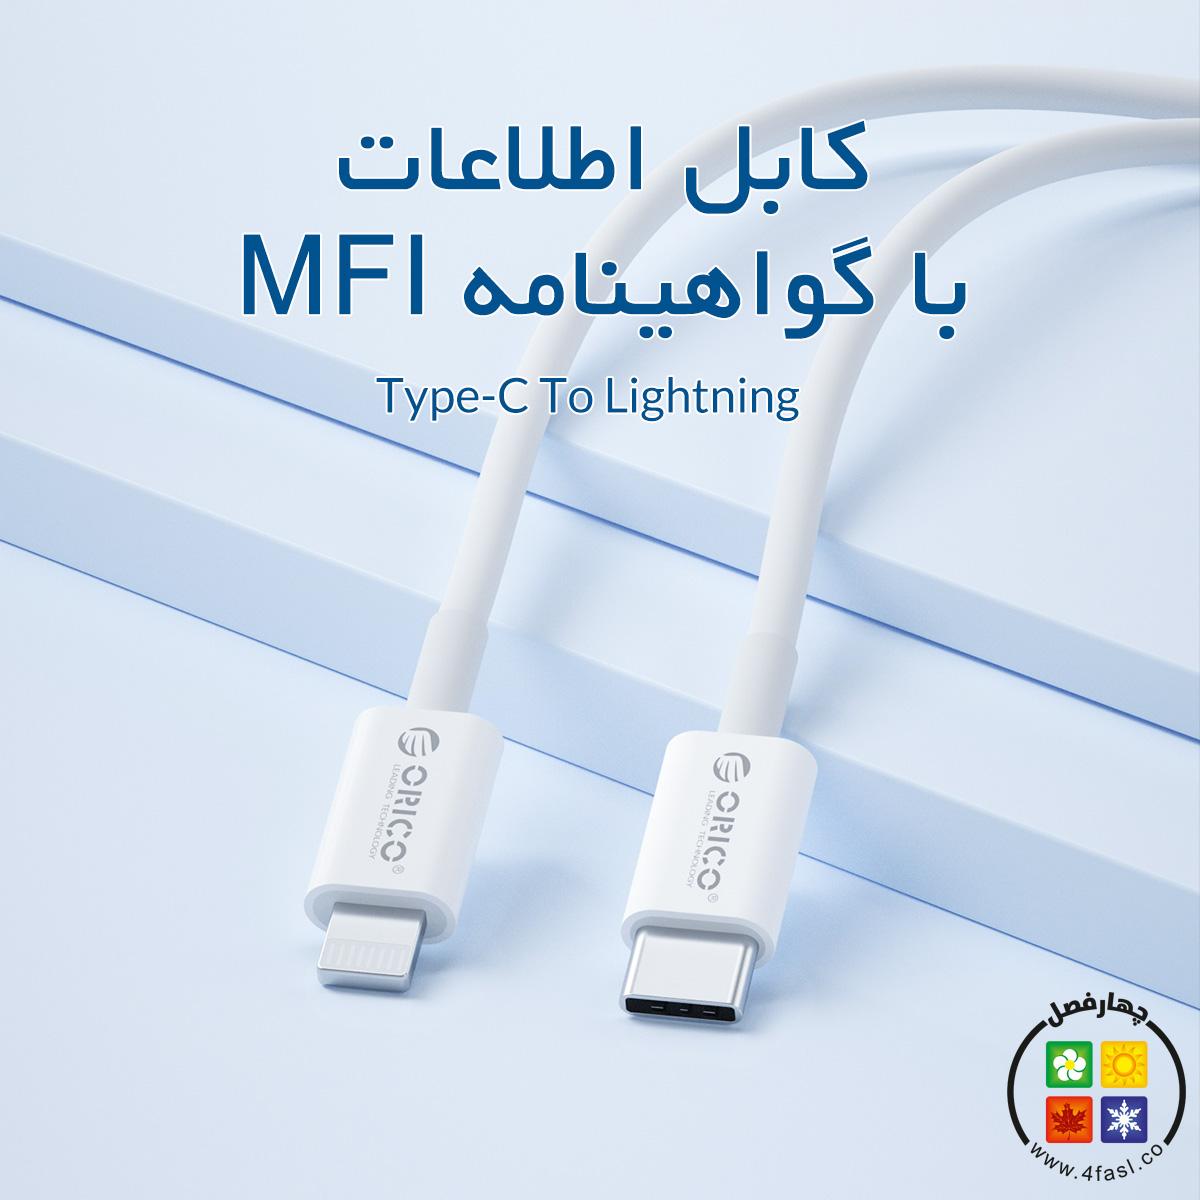 کابل Type-C به Lightning